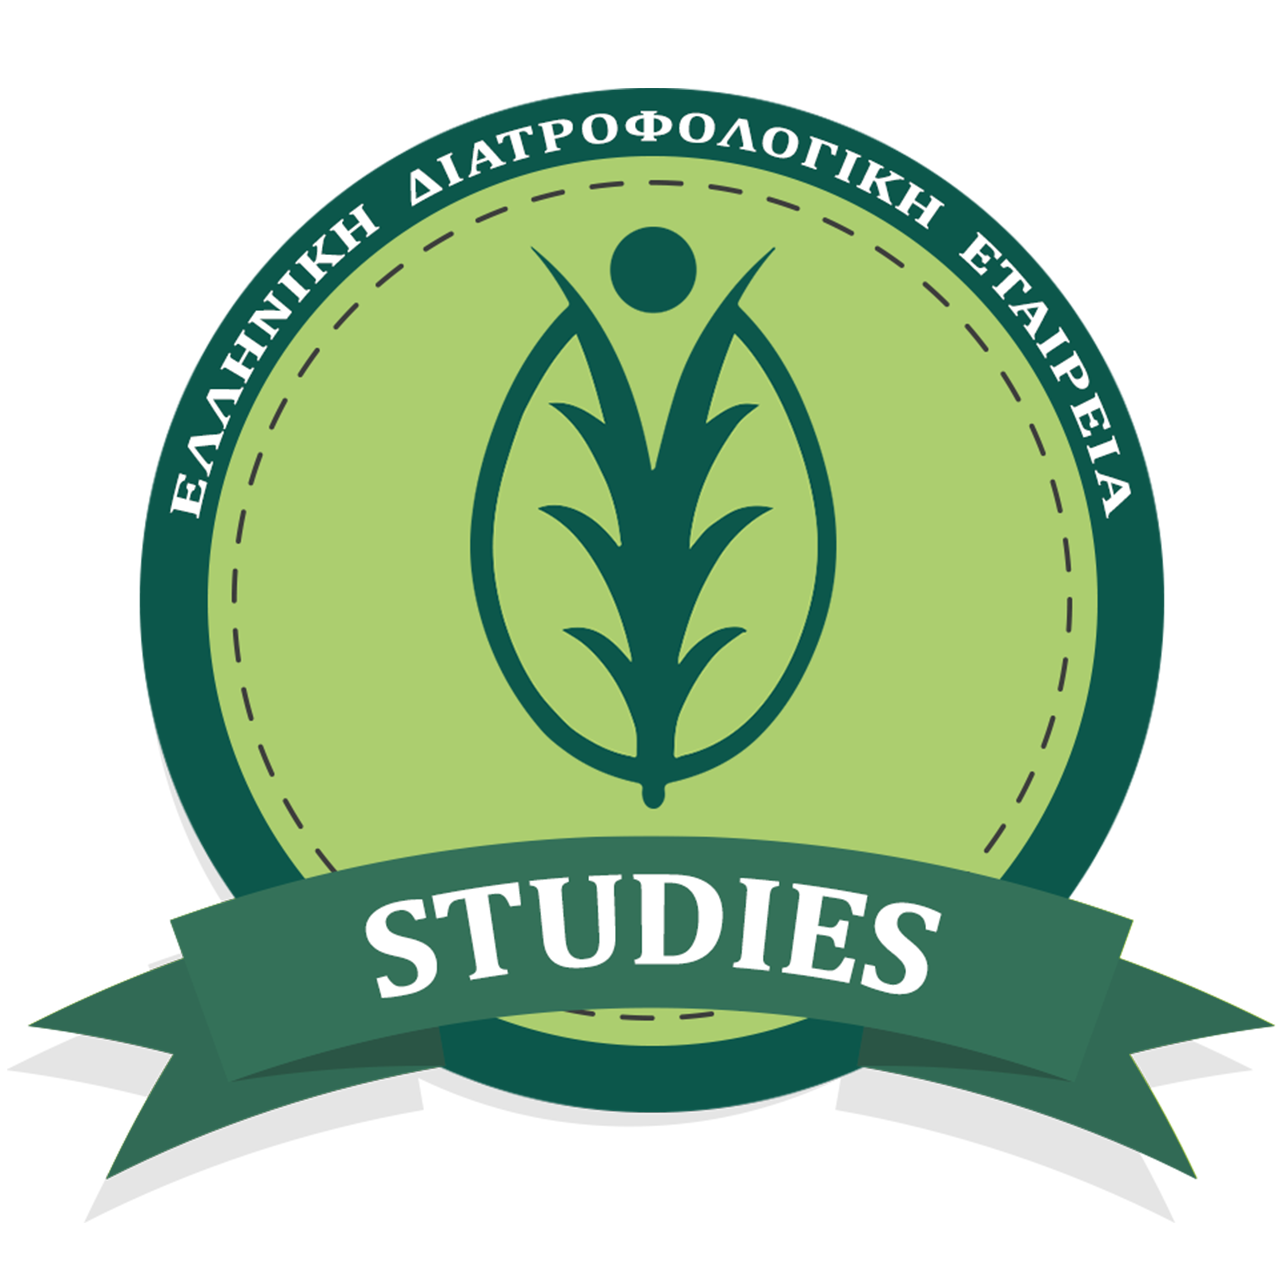 elde studies